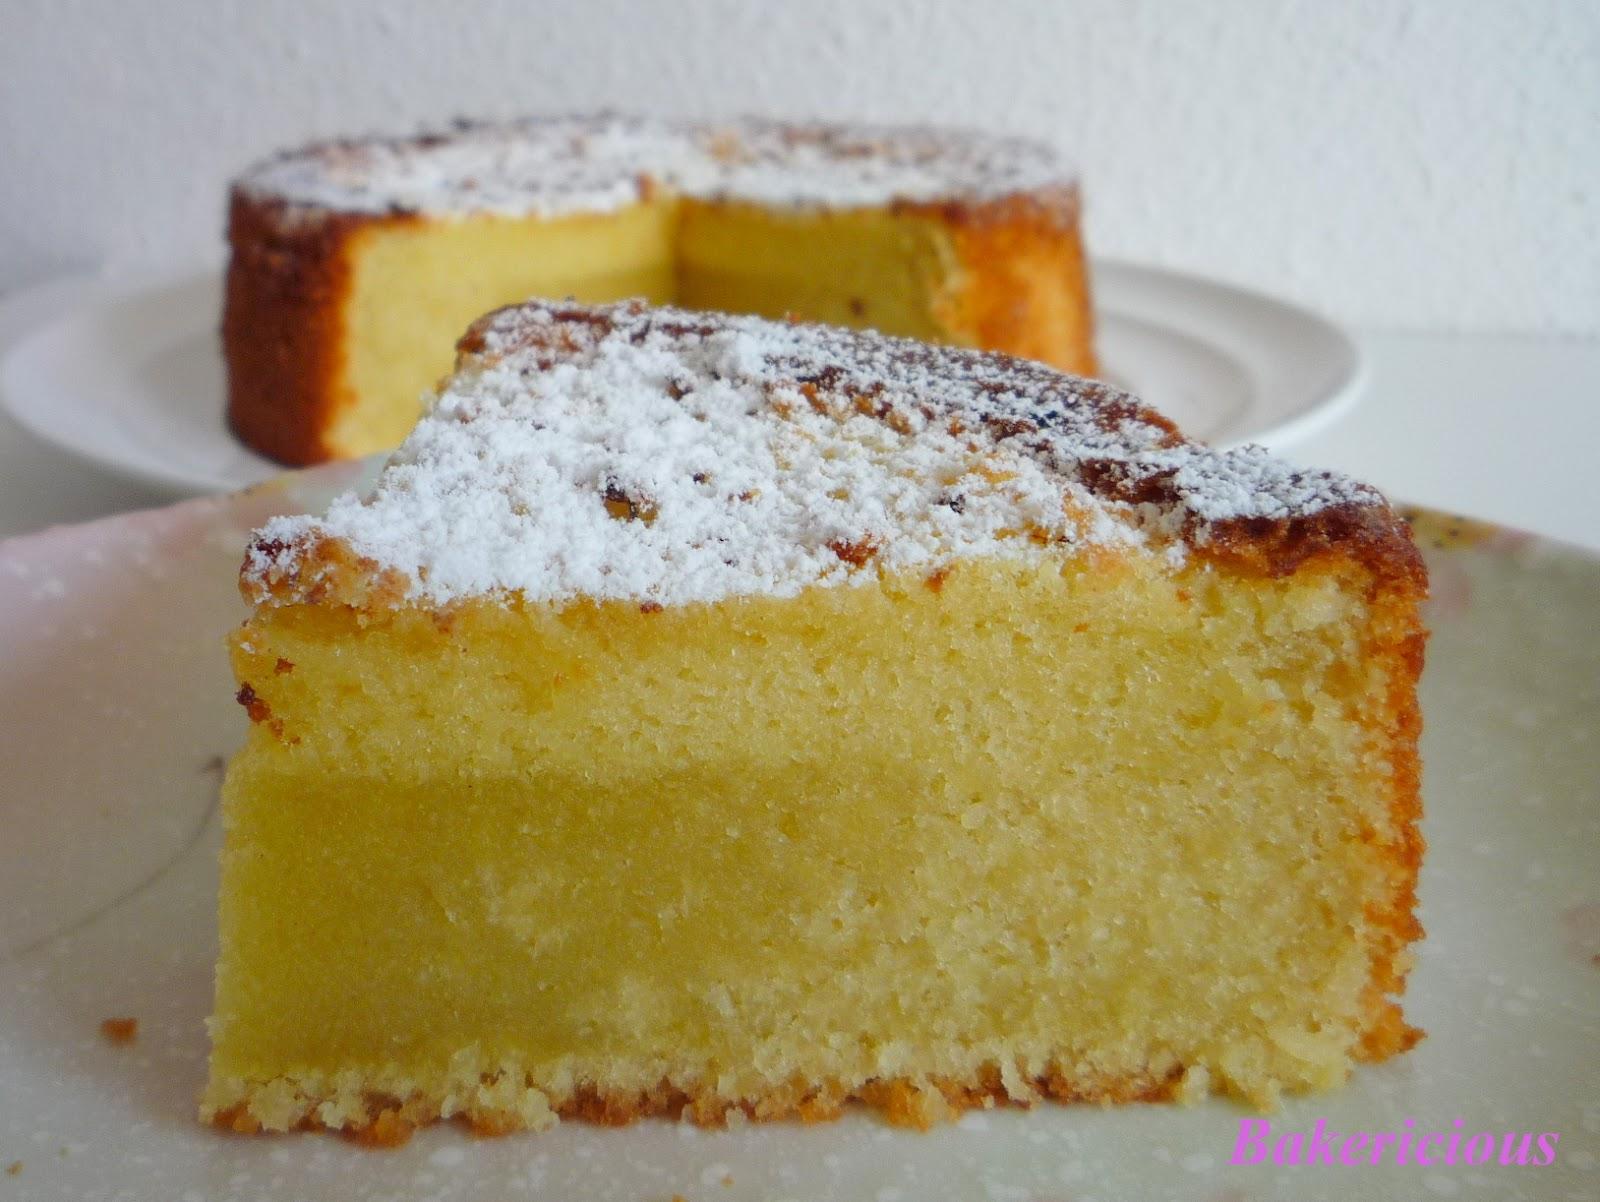 Bakericious: French Almond Cake